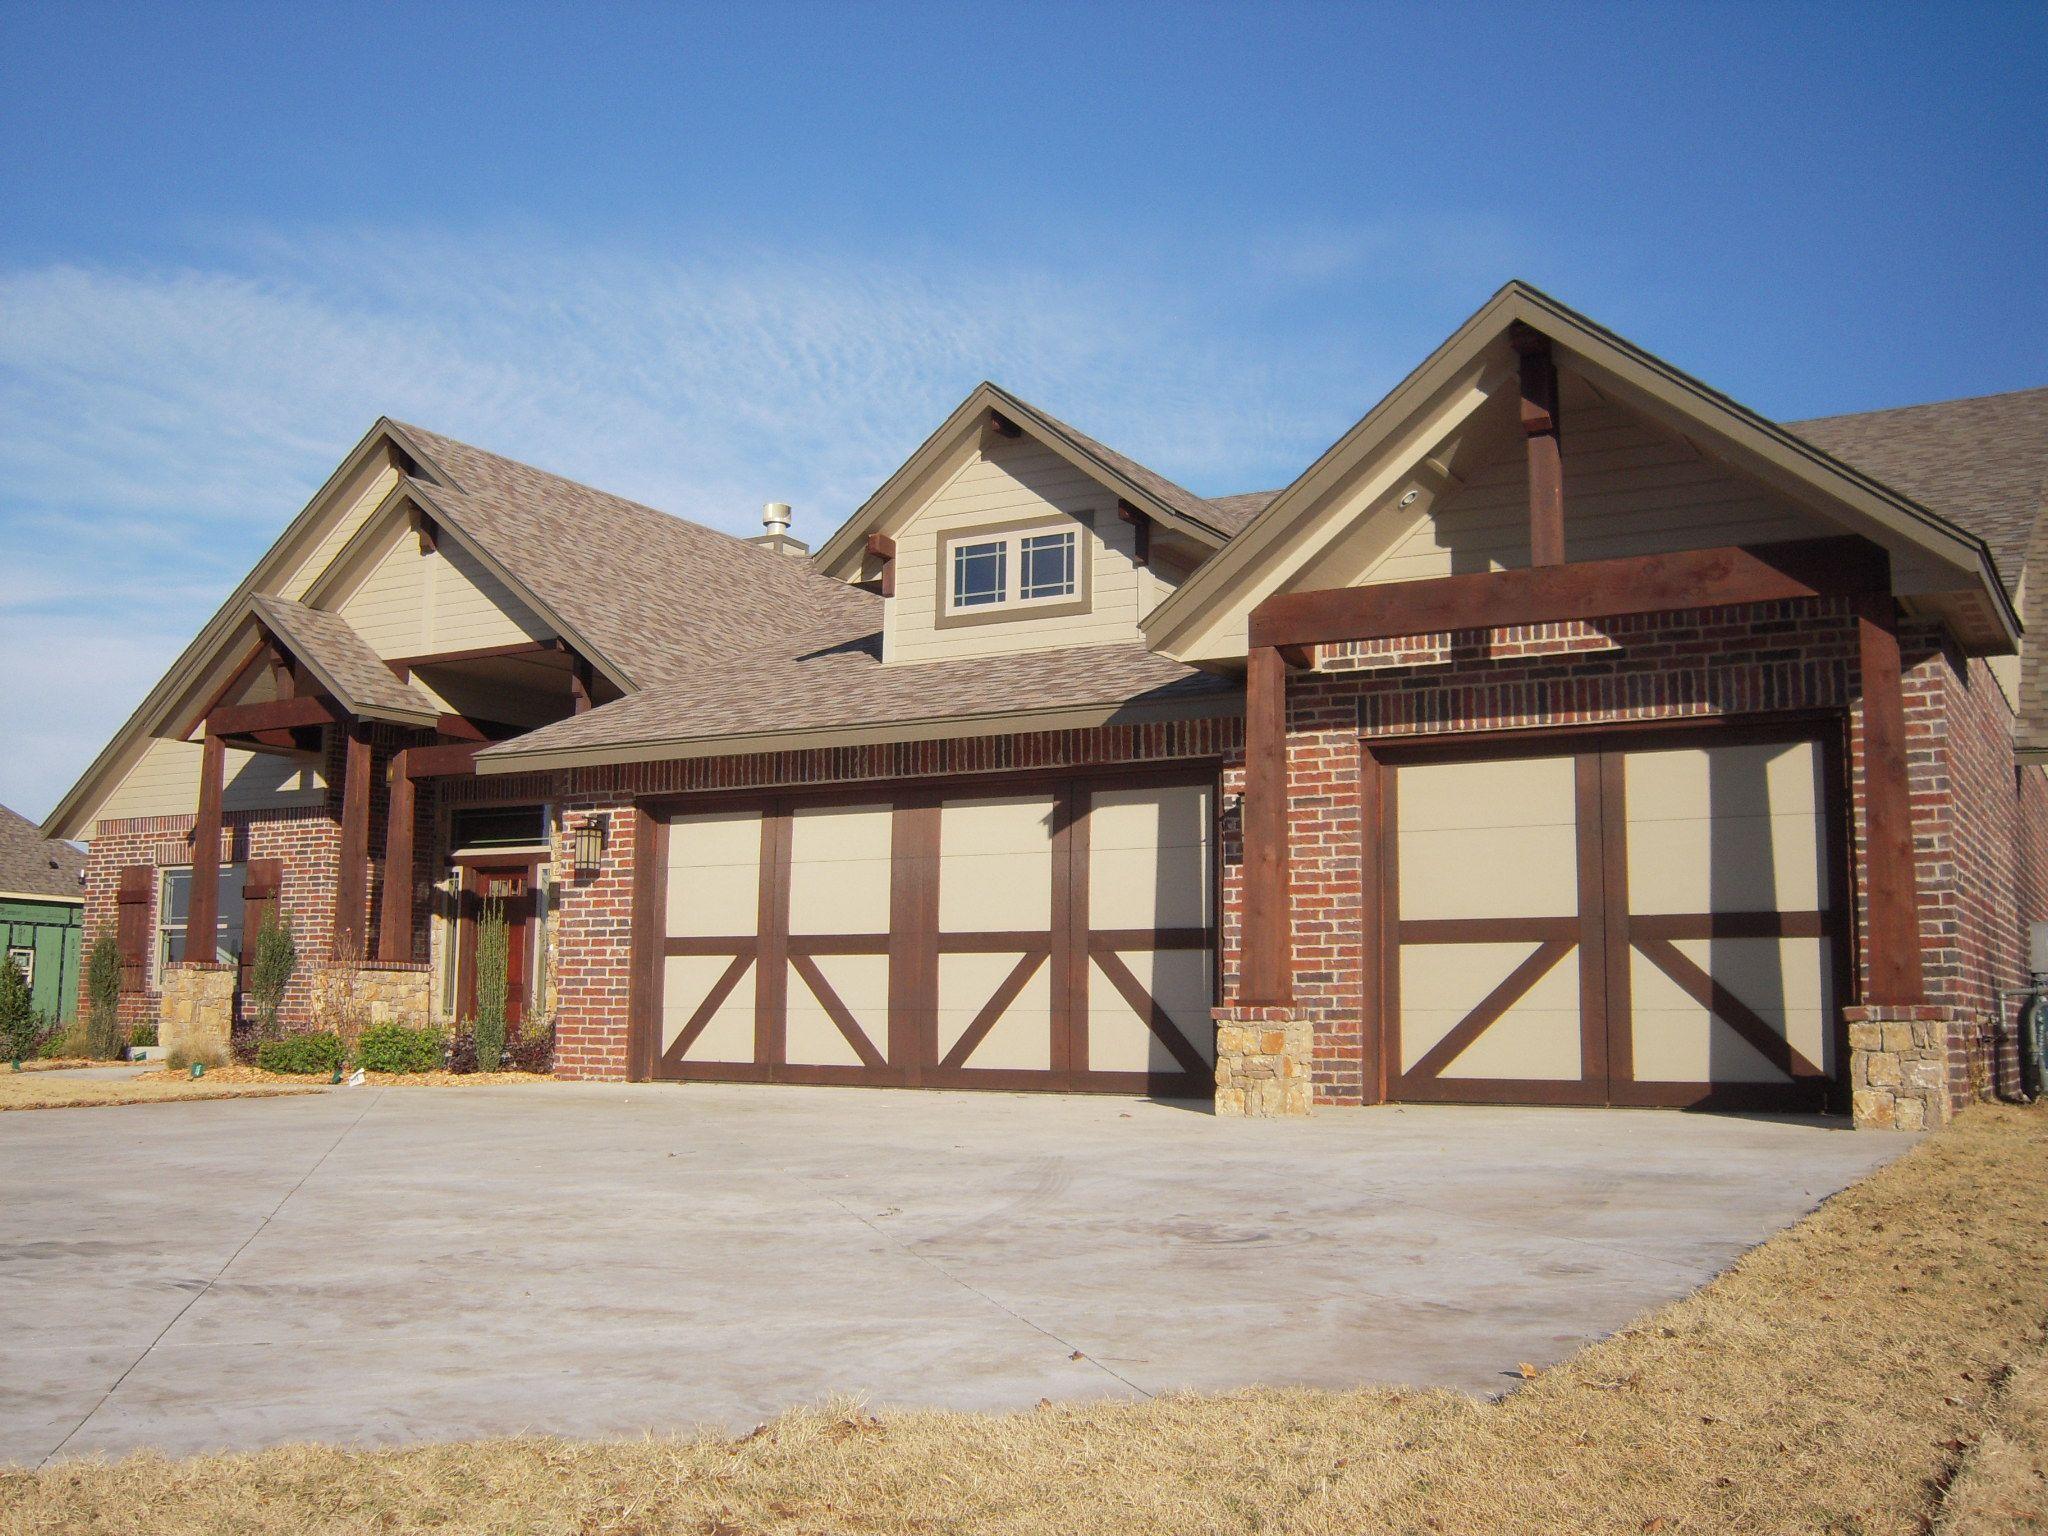 Concept builders breckenridge ii up exp tulsa home for Breckenridge builders